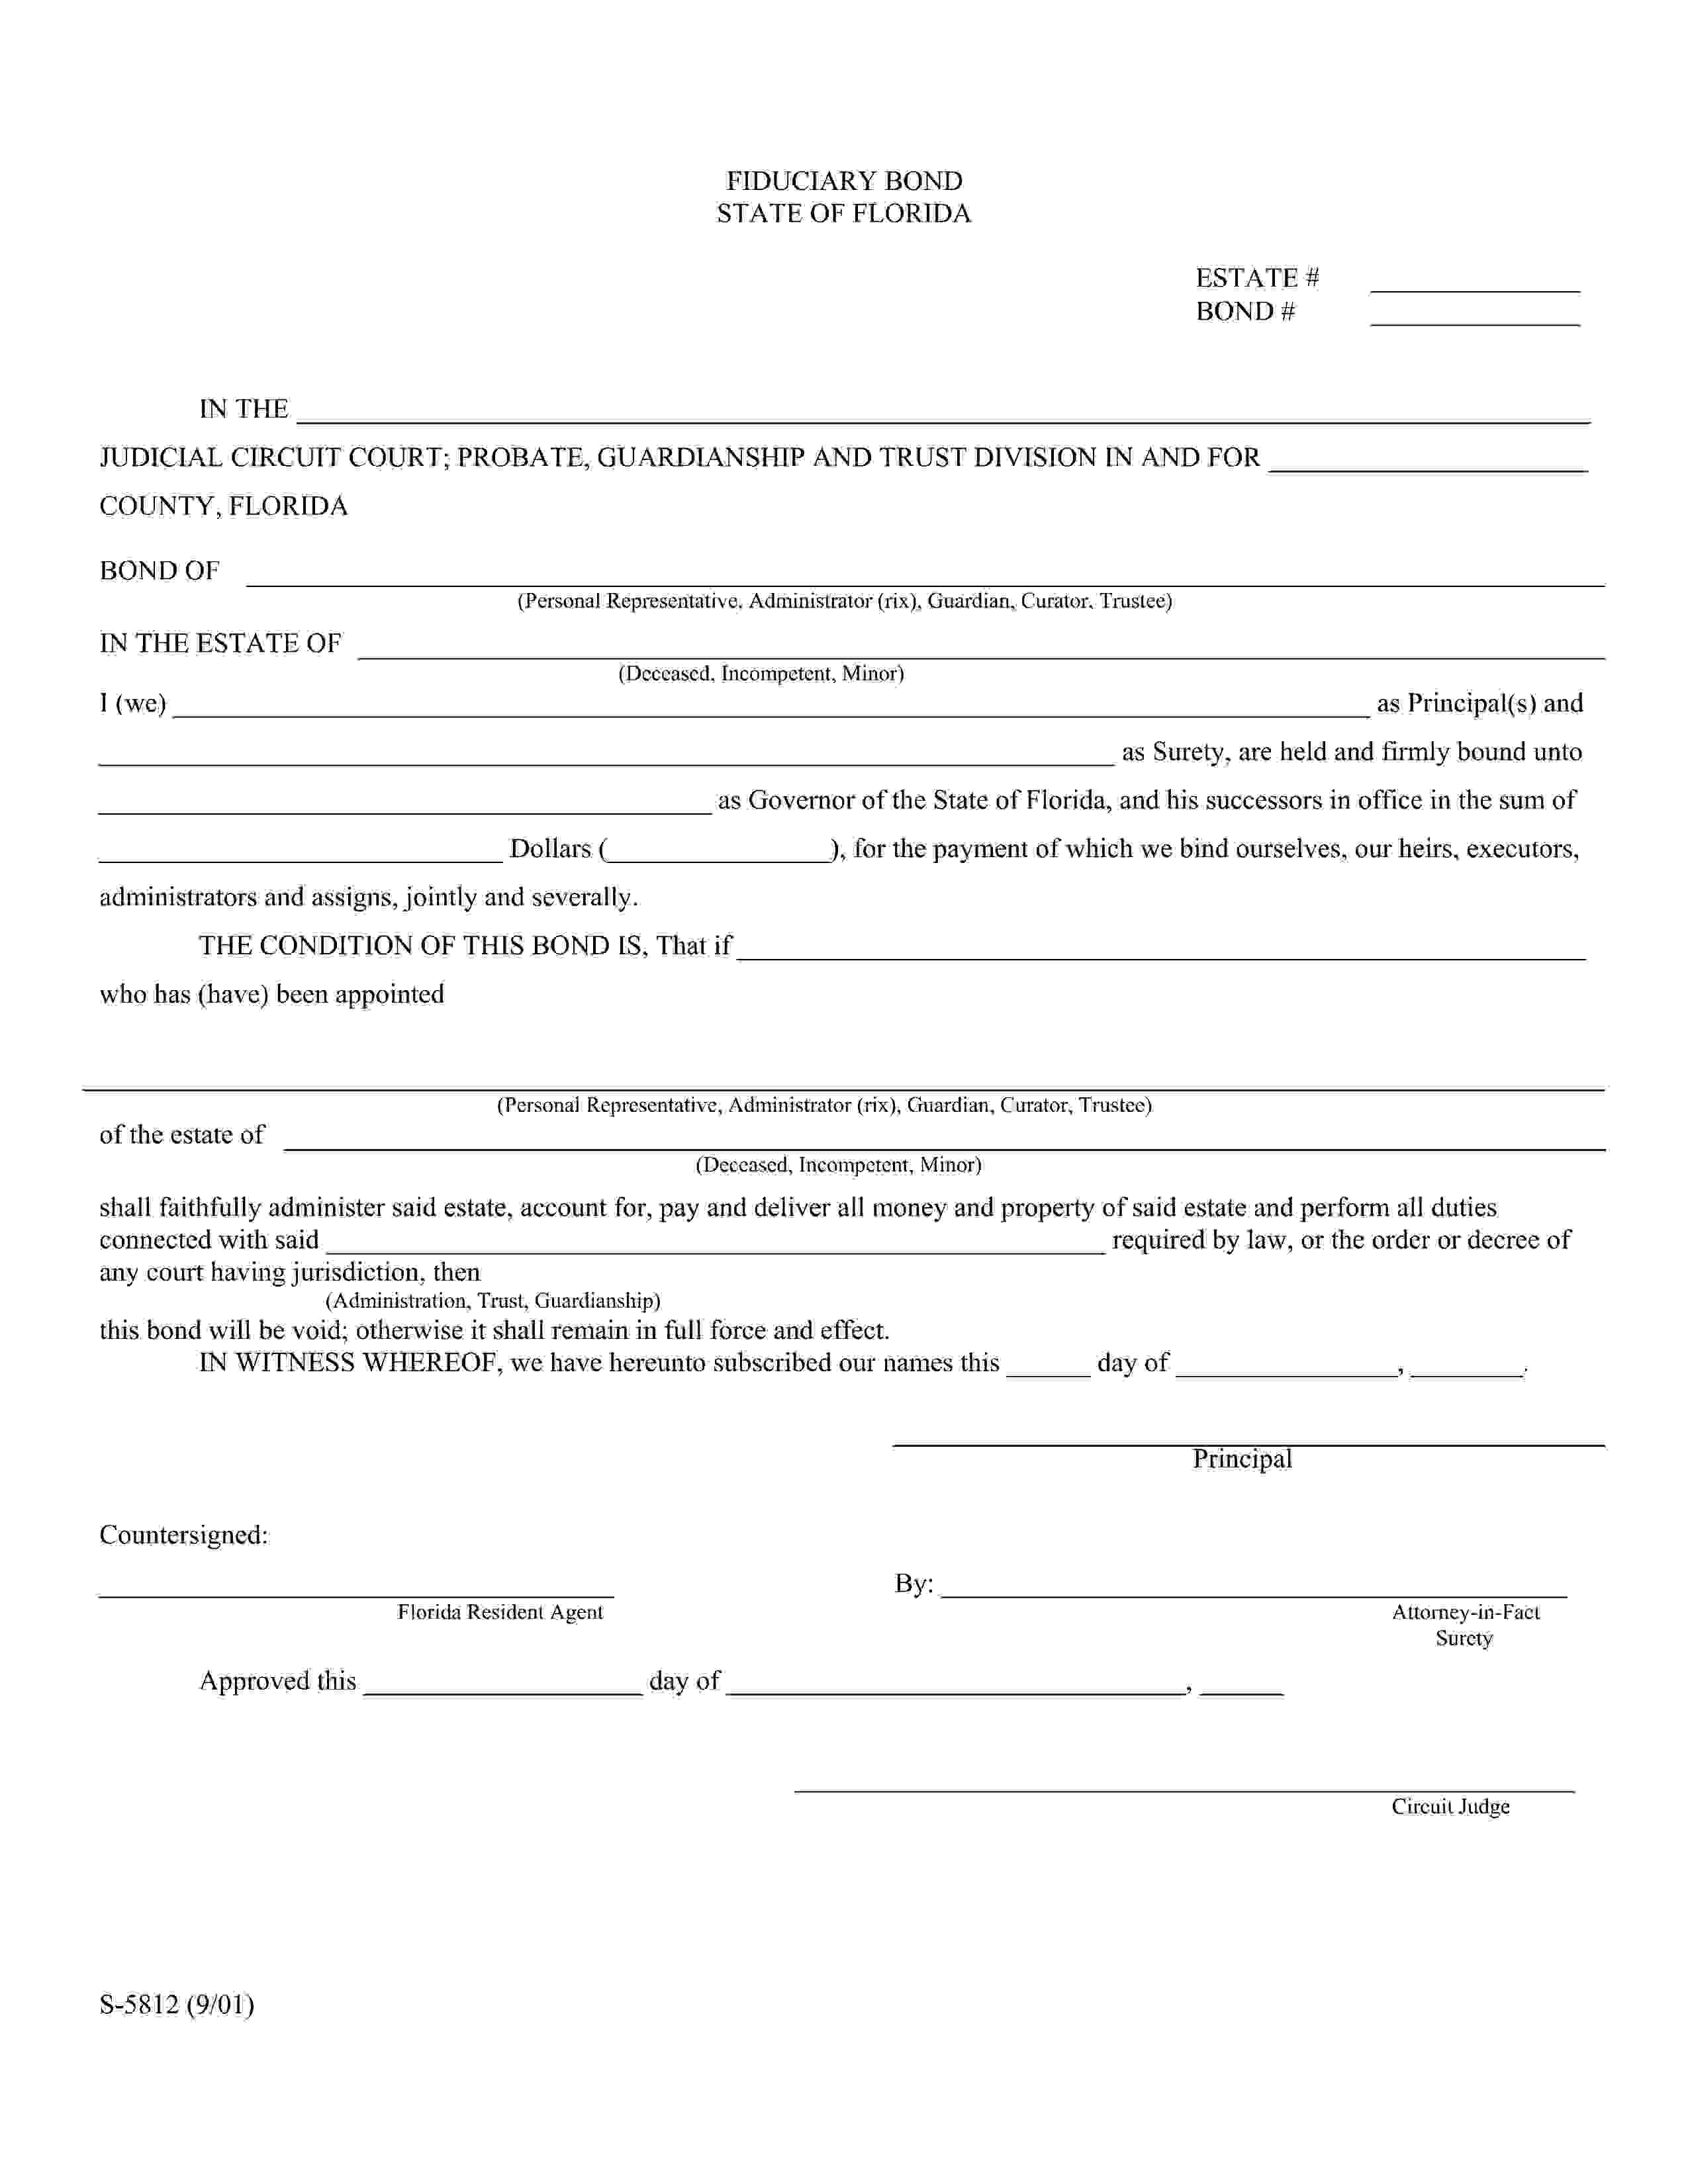 Trustee (Under Will or Deed of Trust) sample image